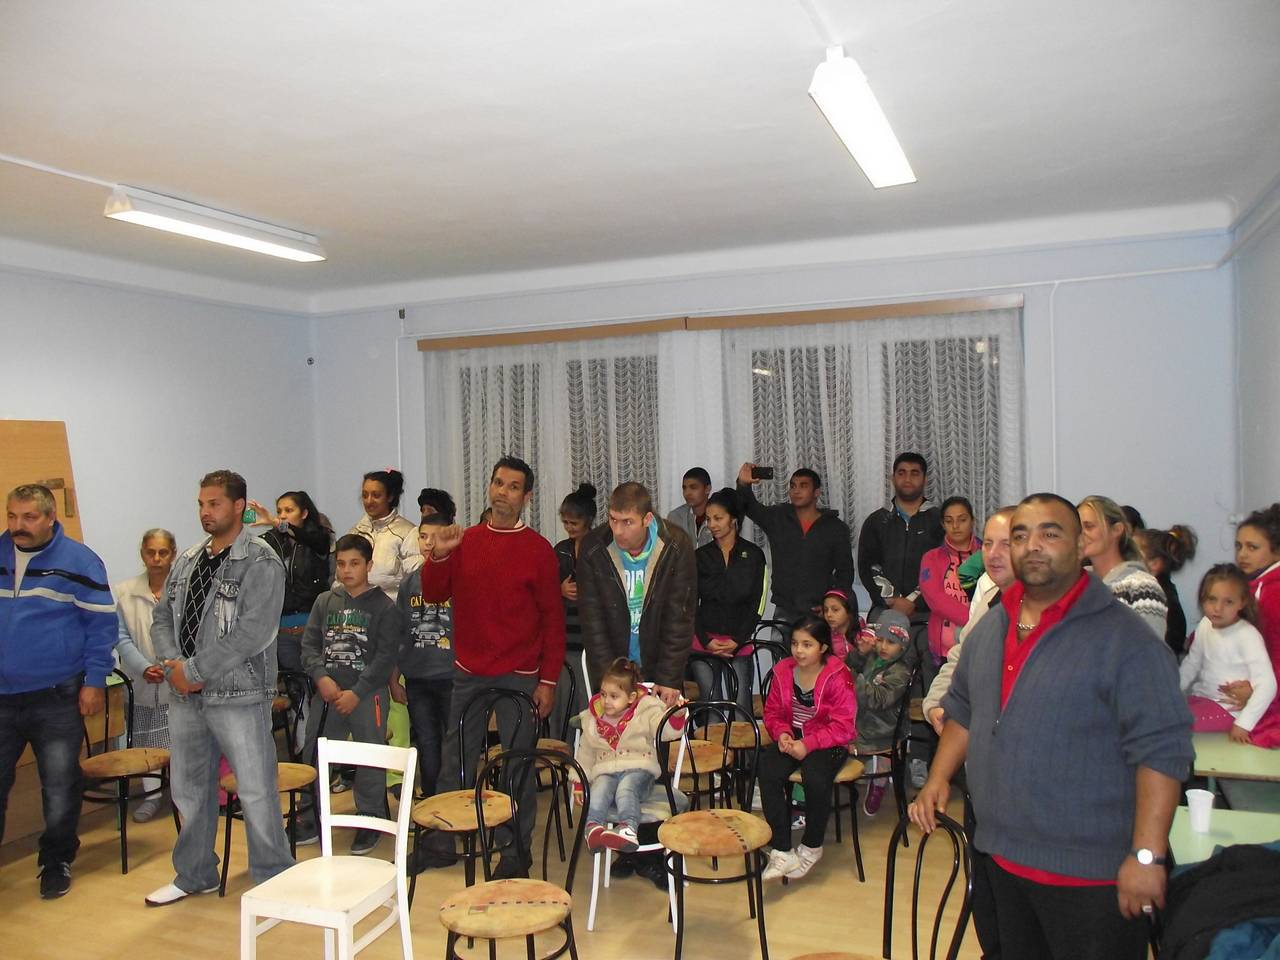 ketegyhaza-evangelizacio-2014-1